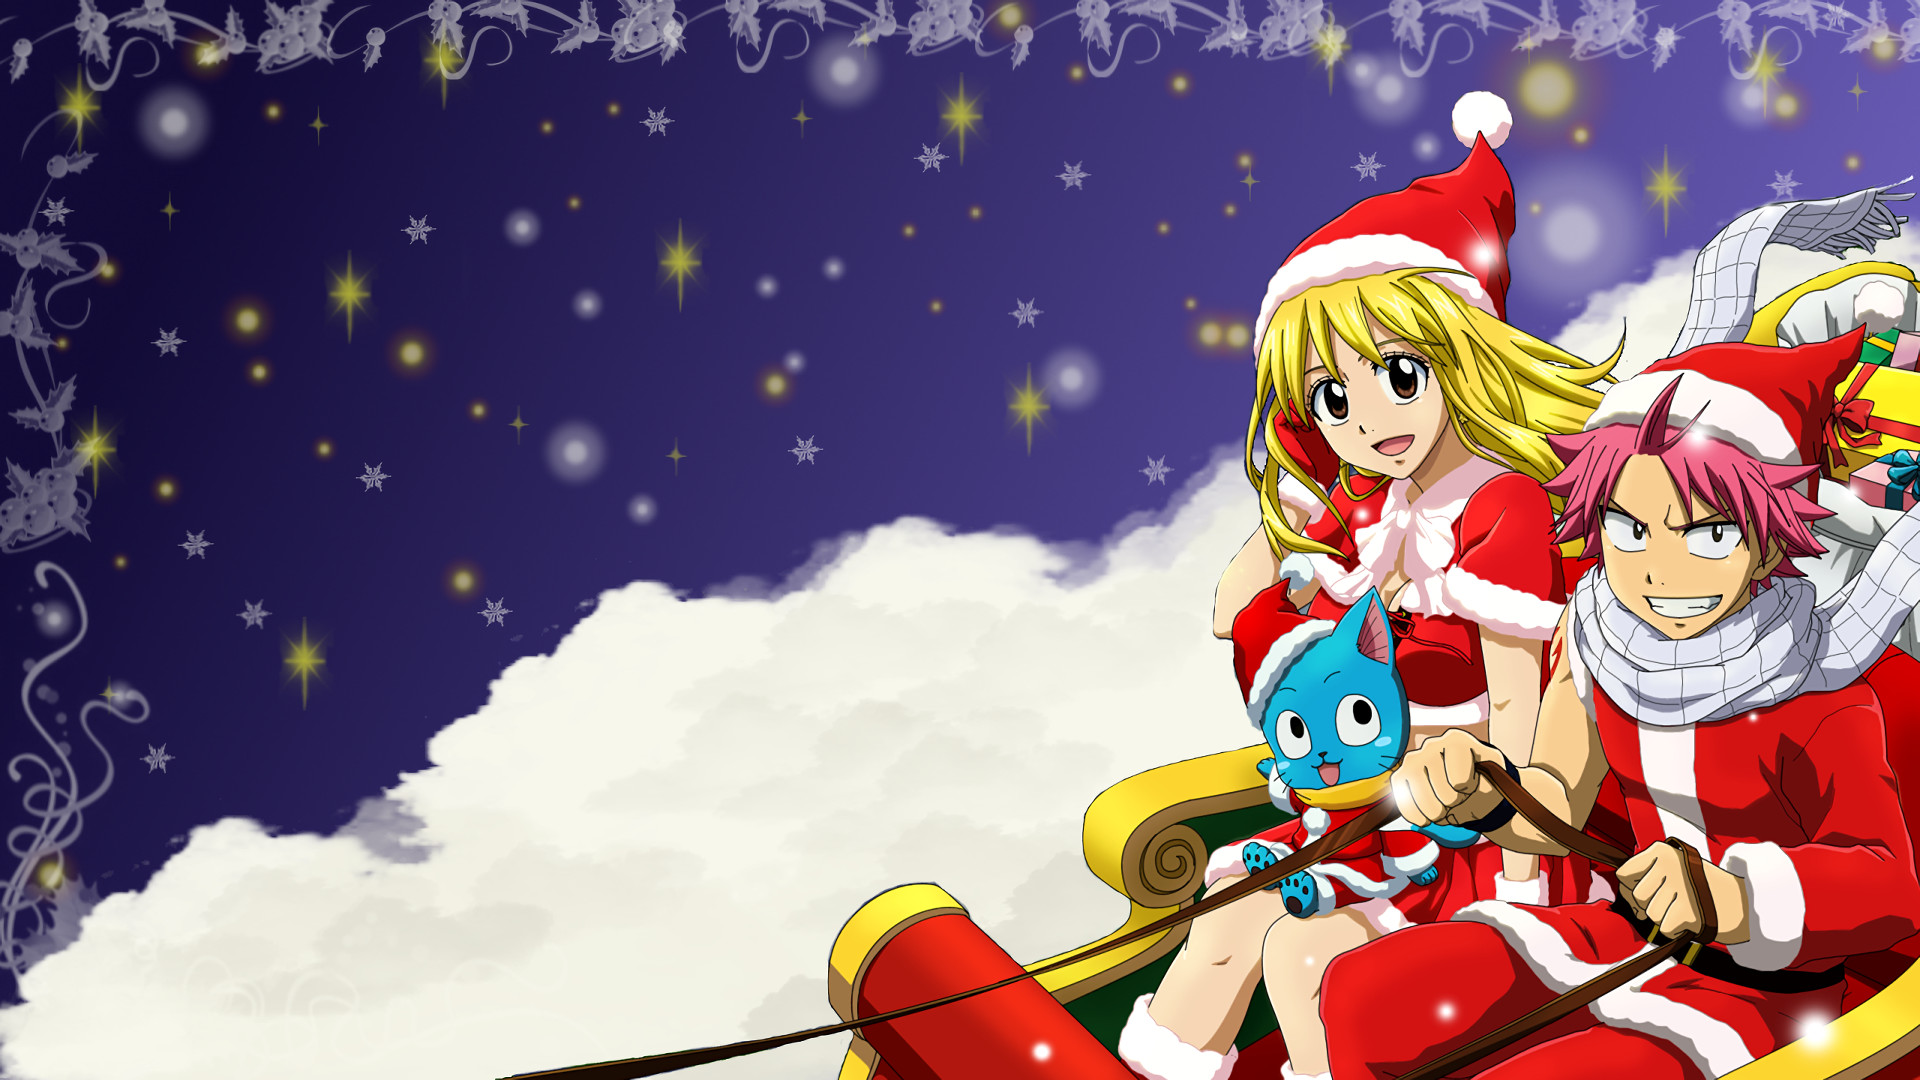 Anime – Fairy Tail Lucy Heartfilia Natsu Dragneel Happy (Fairy Tail) Christmas  Wallpaper